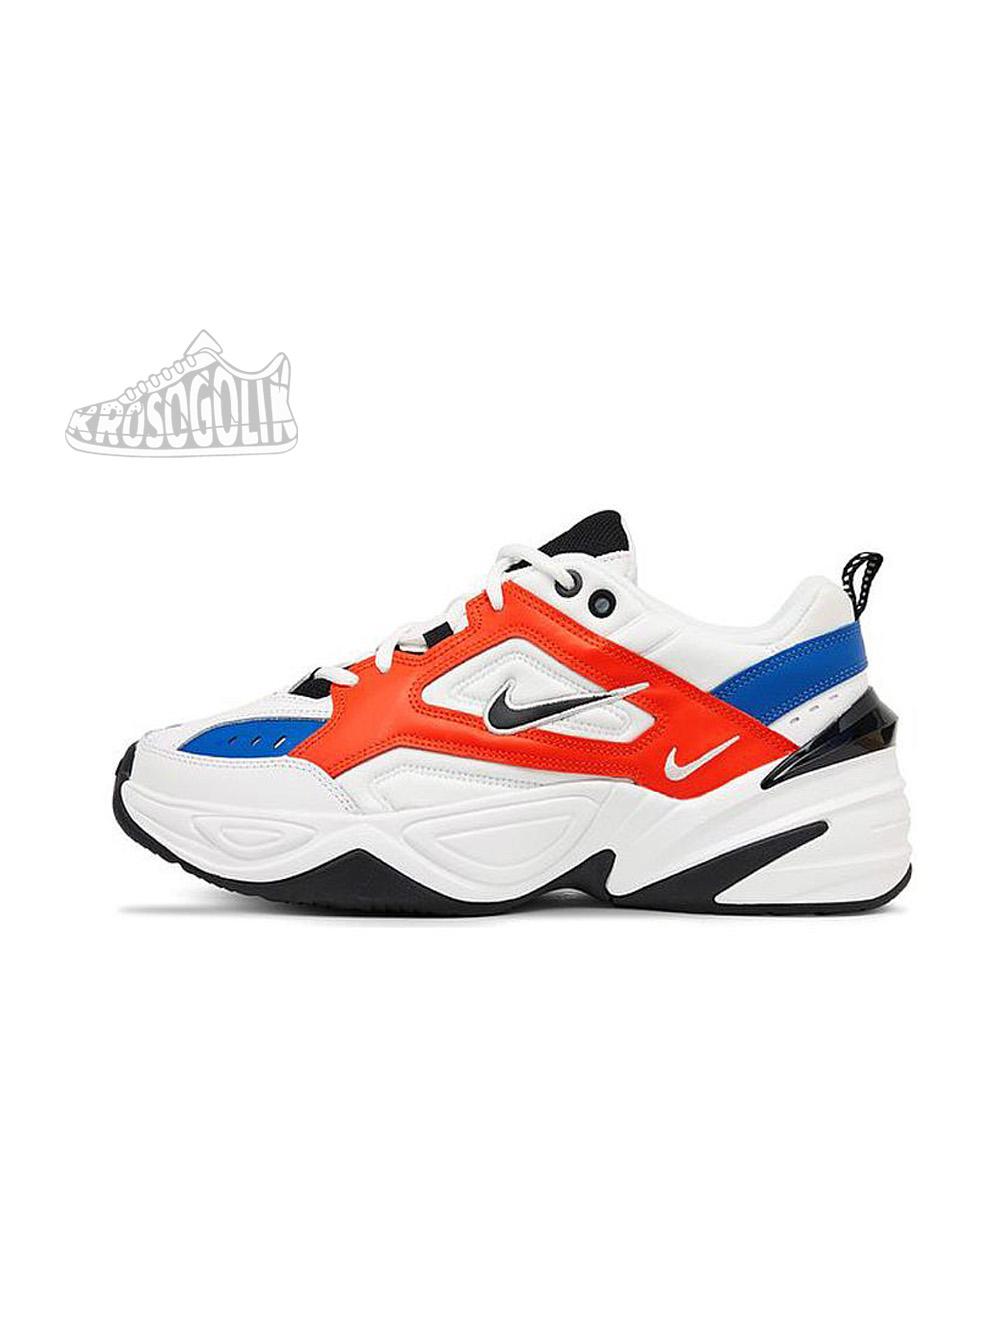 45a1d0bfed292 Купить мужские кроссовки Nike M2K Tekno на krosogolik.com